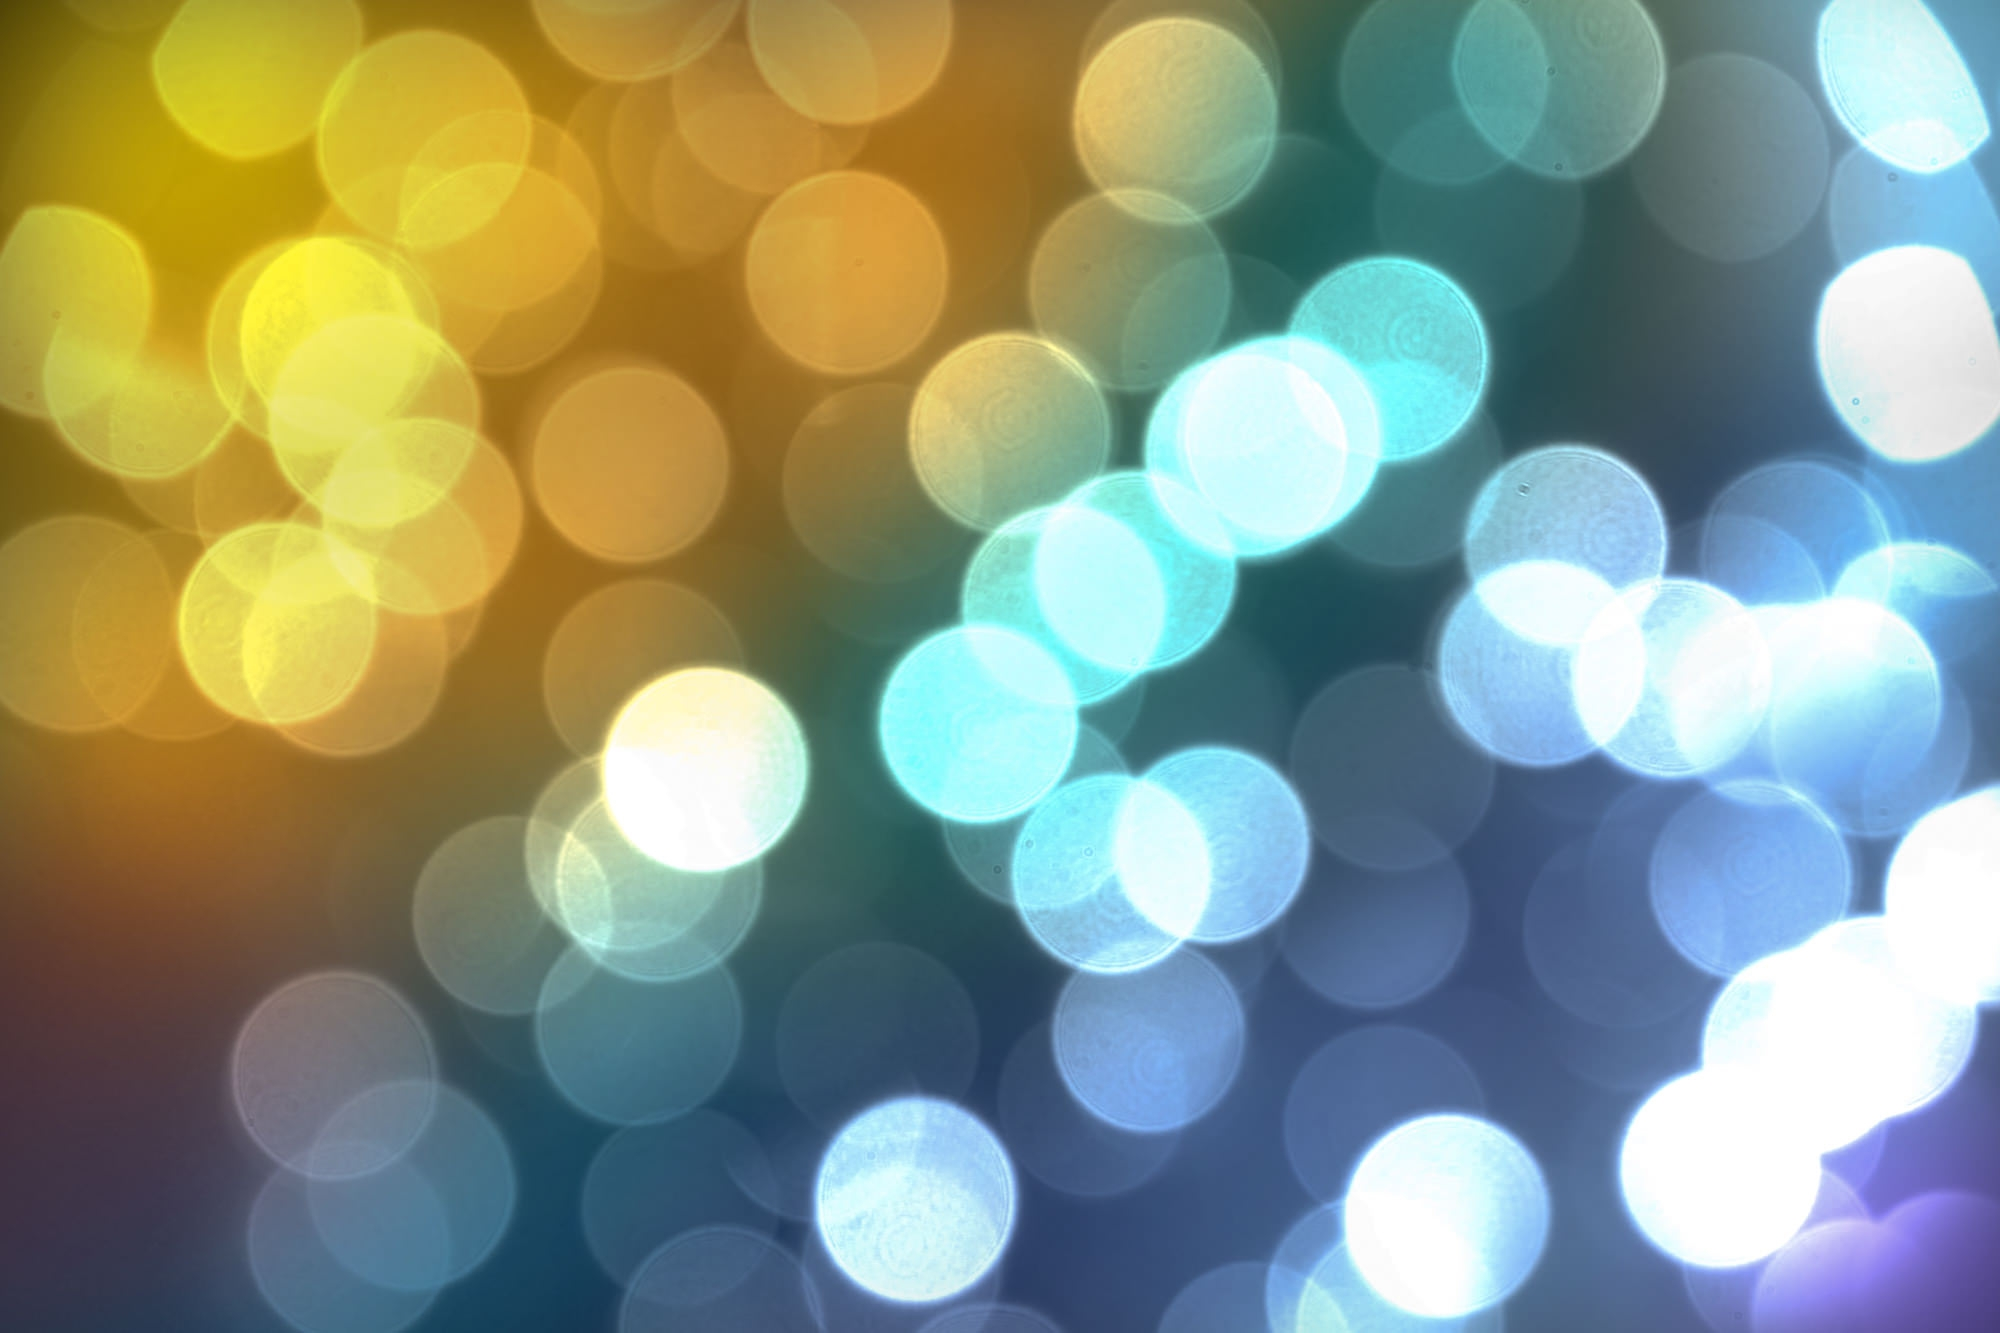 Light Bokeh Textures For Free